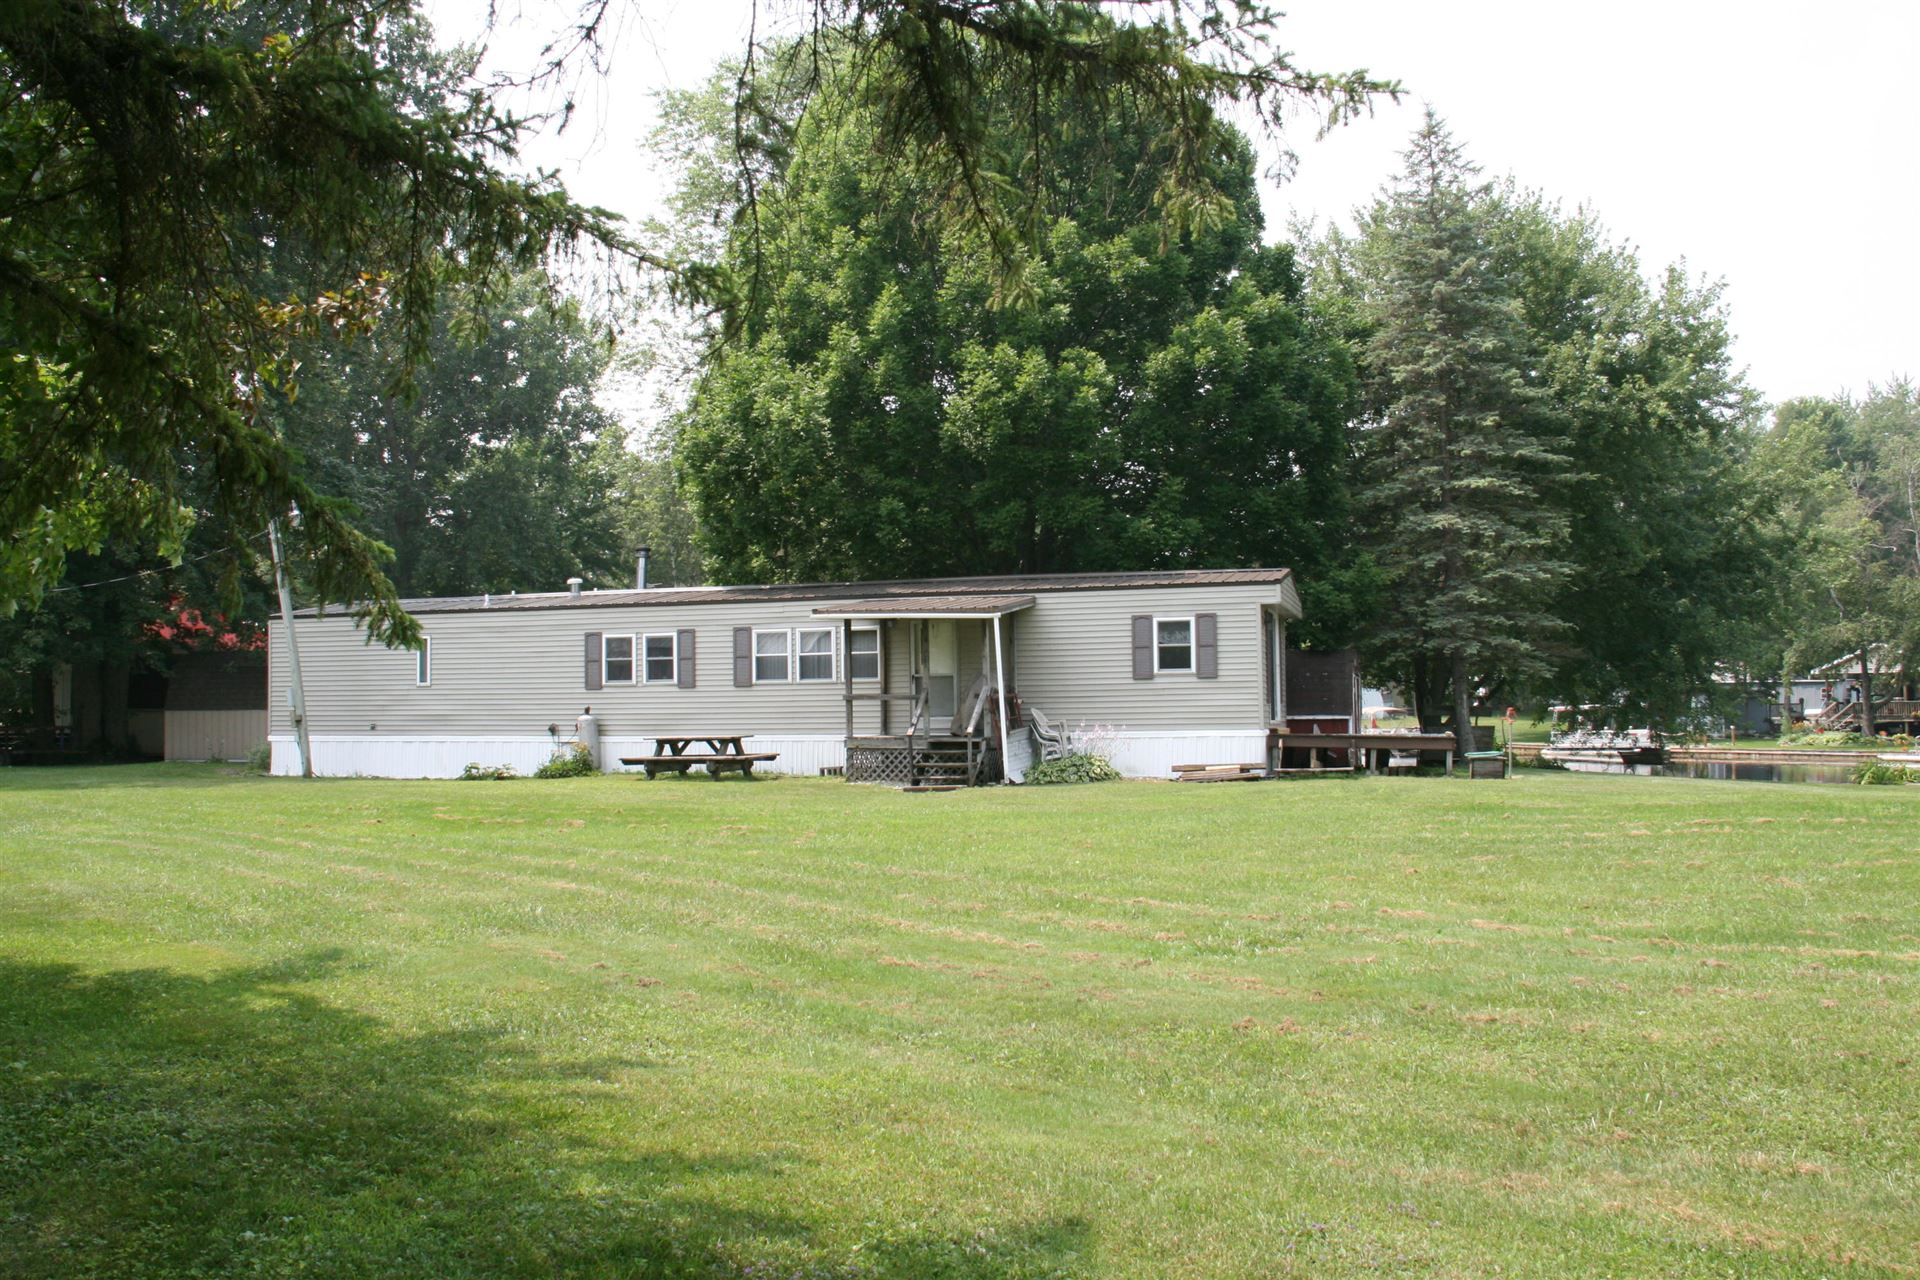 16623 Pine Point Drive, Barryton, MI 49305 - MLS#: 21064965